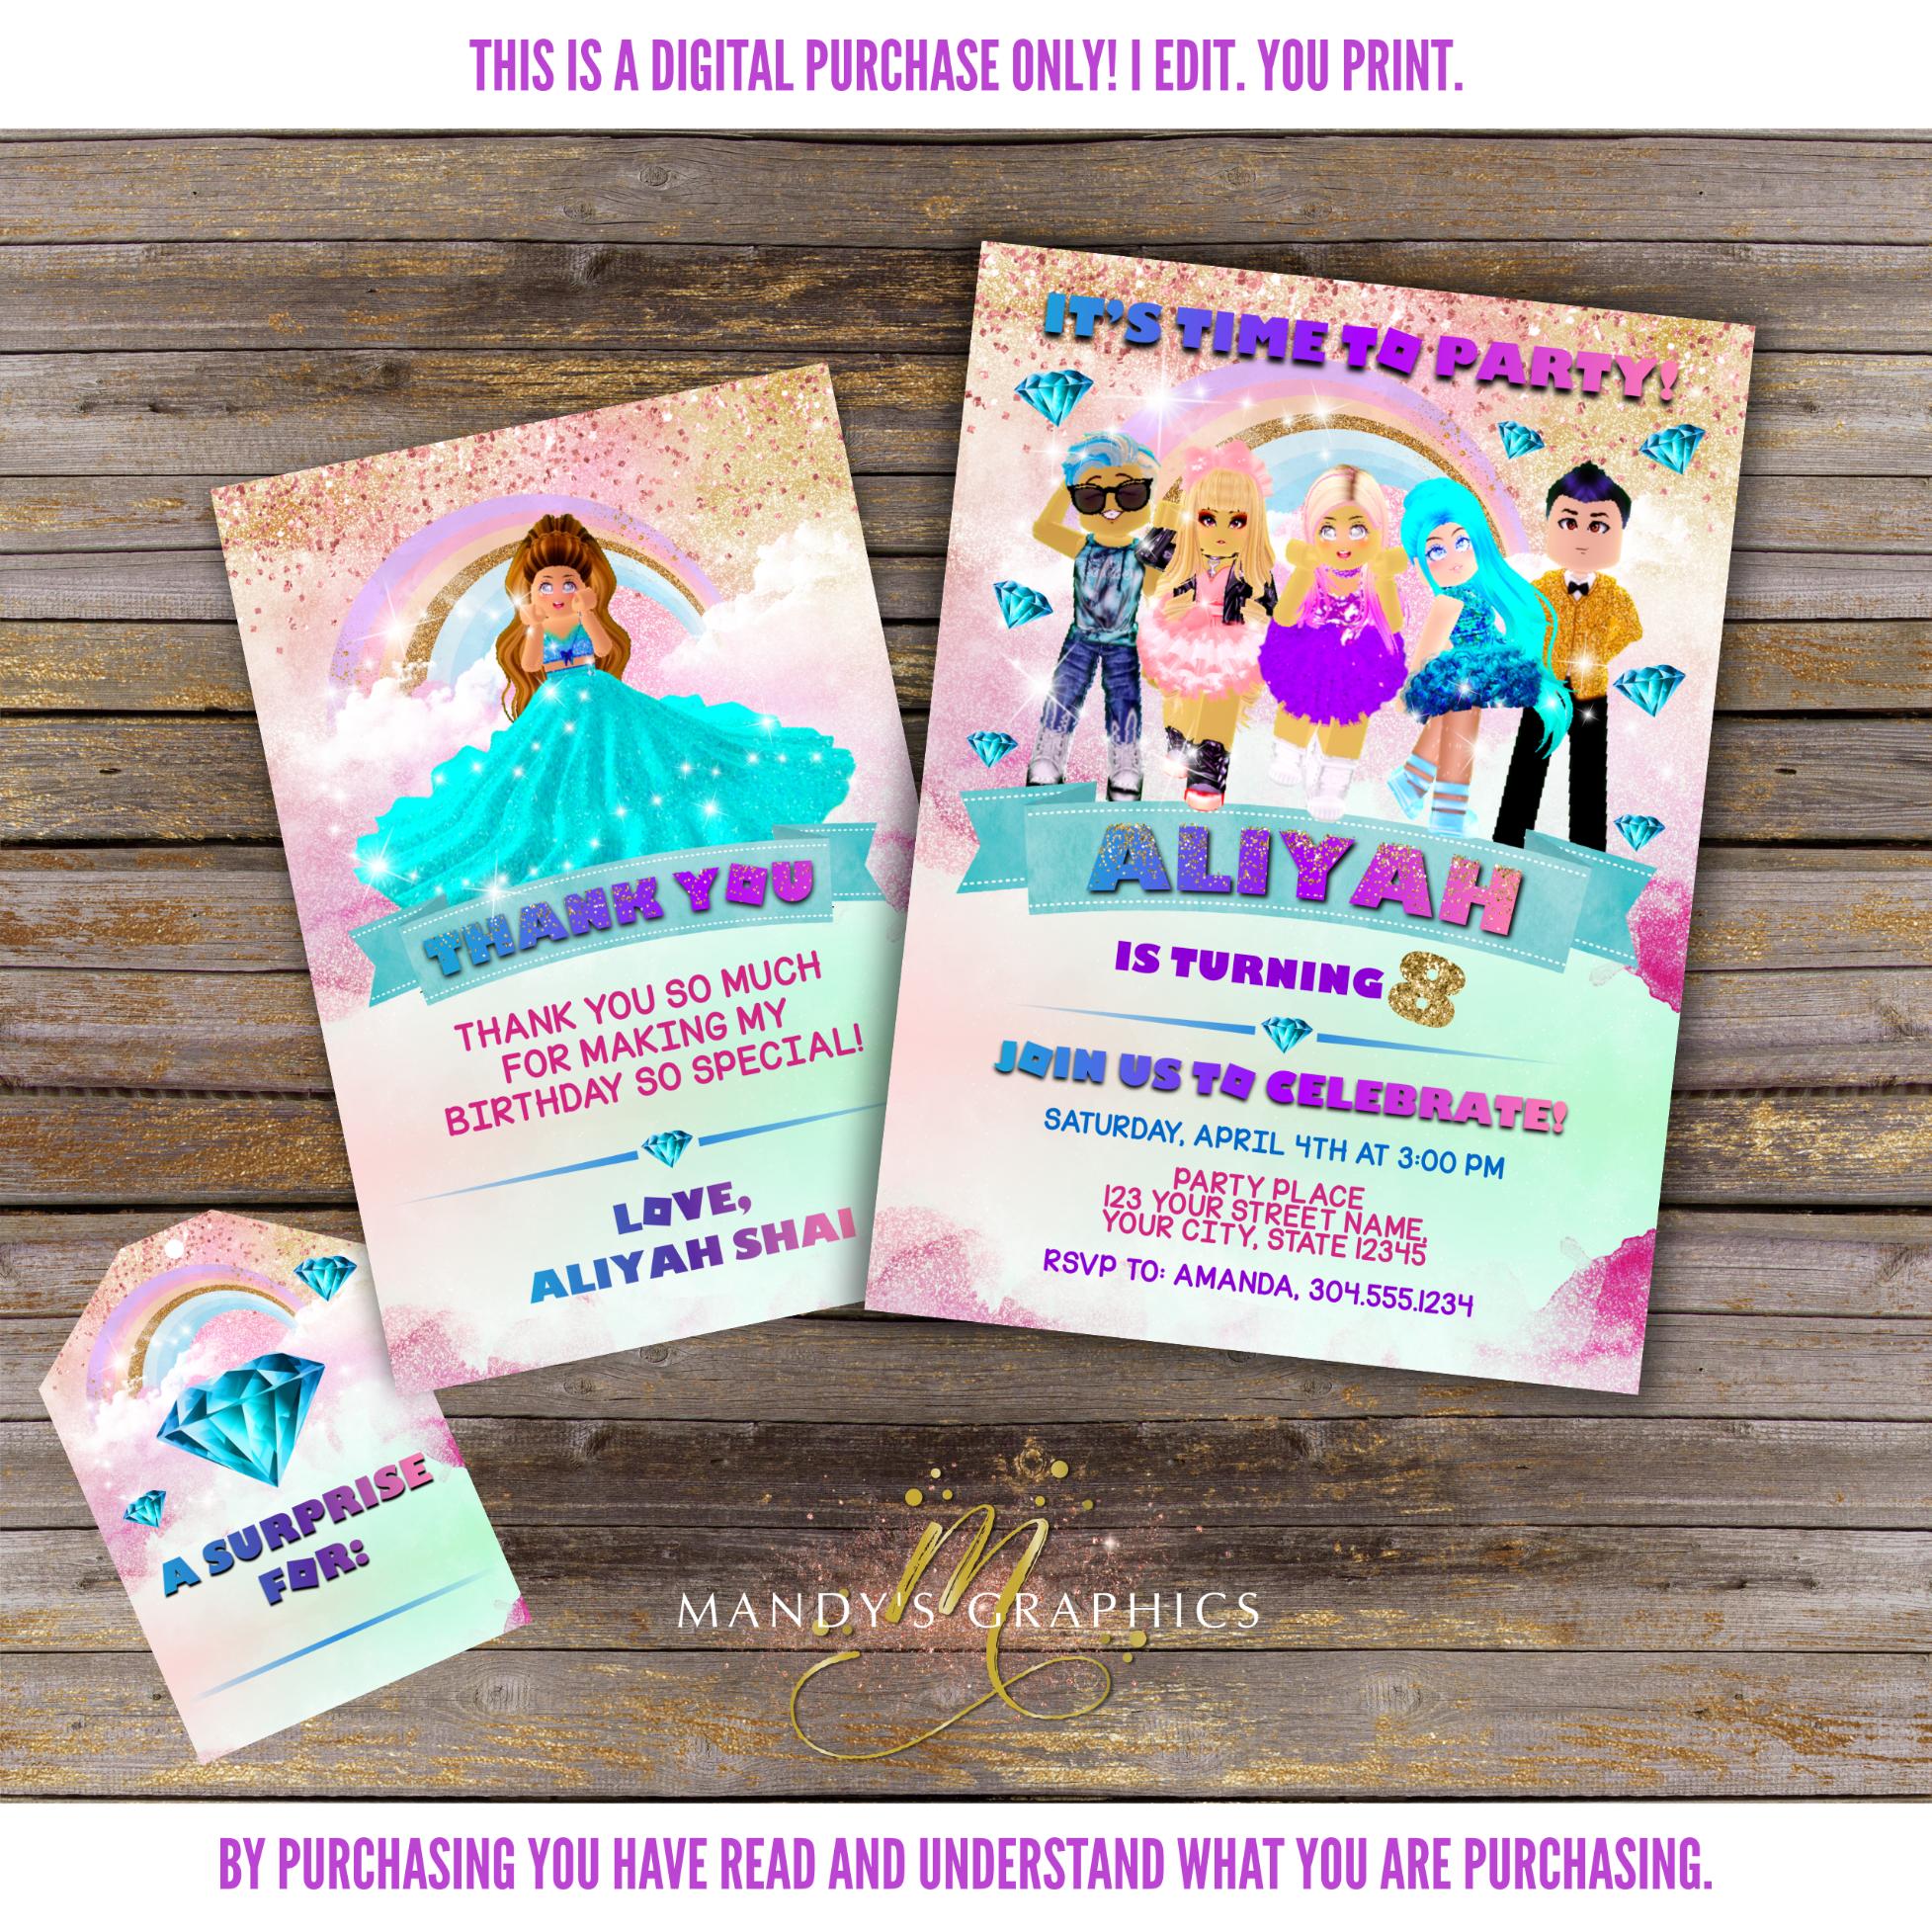 Roblox Girl Birthday Party Roblox Generator 32 Roblox Royale High Birthday Invitation In 2020 Birthday Invitations Digital Invitations Birthday